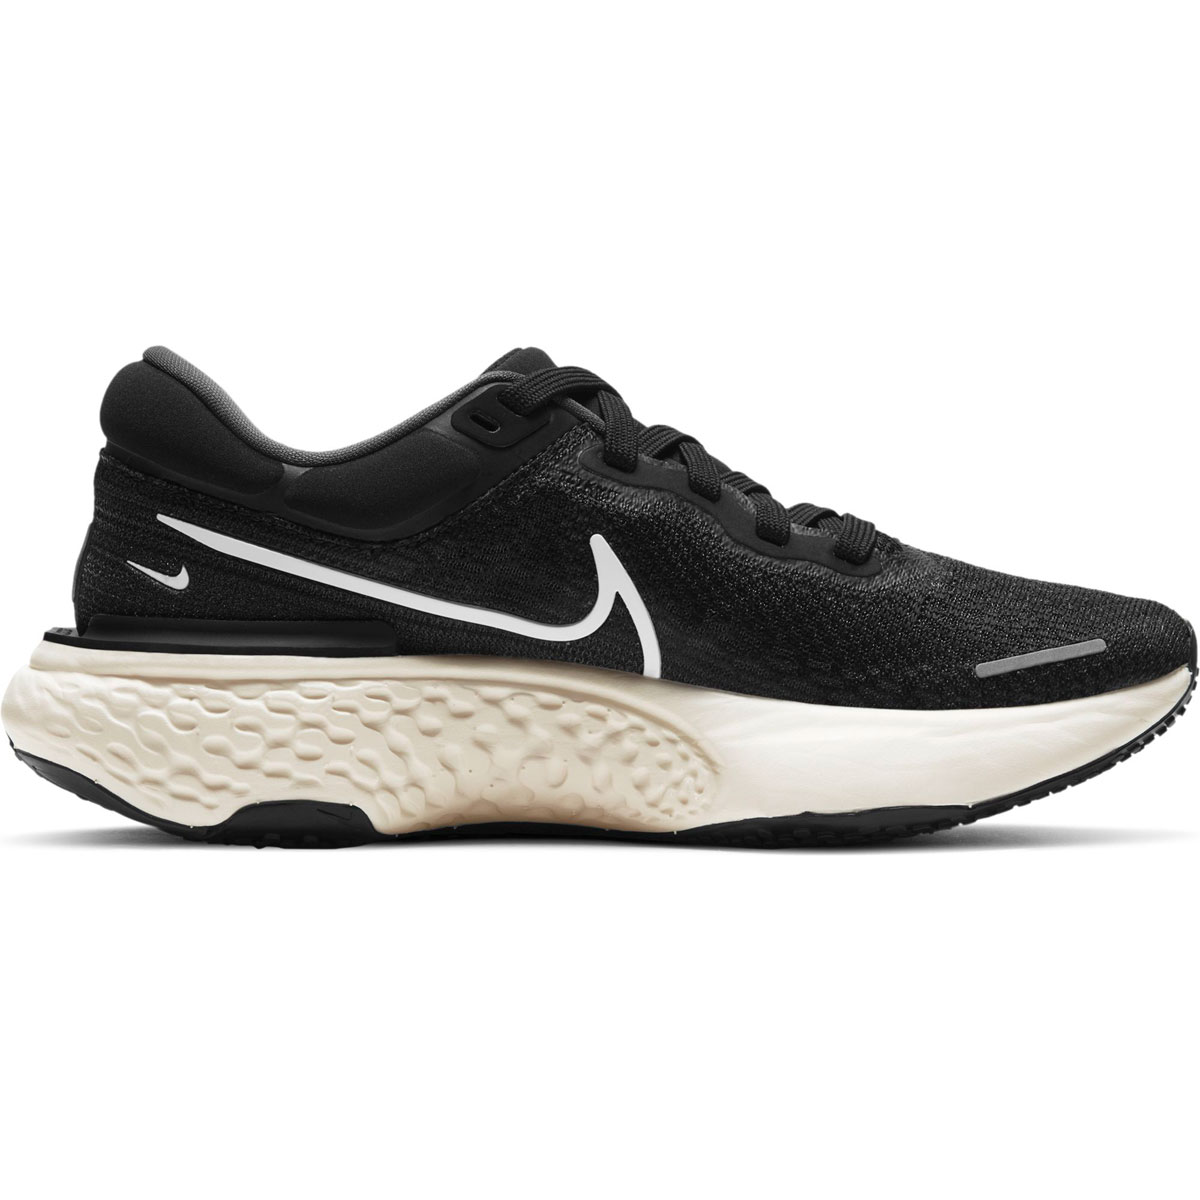 Women's Nike Zoomx Invincible Run FlyKnit Running Shoe - Color: Black/White/Iron Grey - Size: 5 - Width: Regular, Black/White/Iron Grey, large, image 1